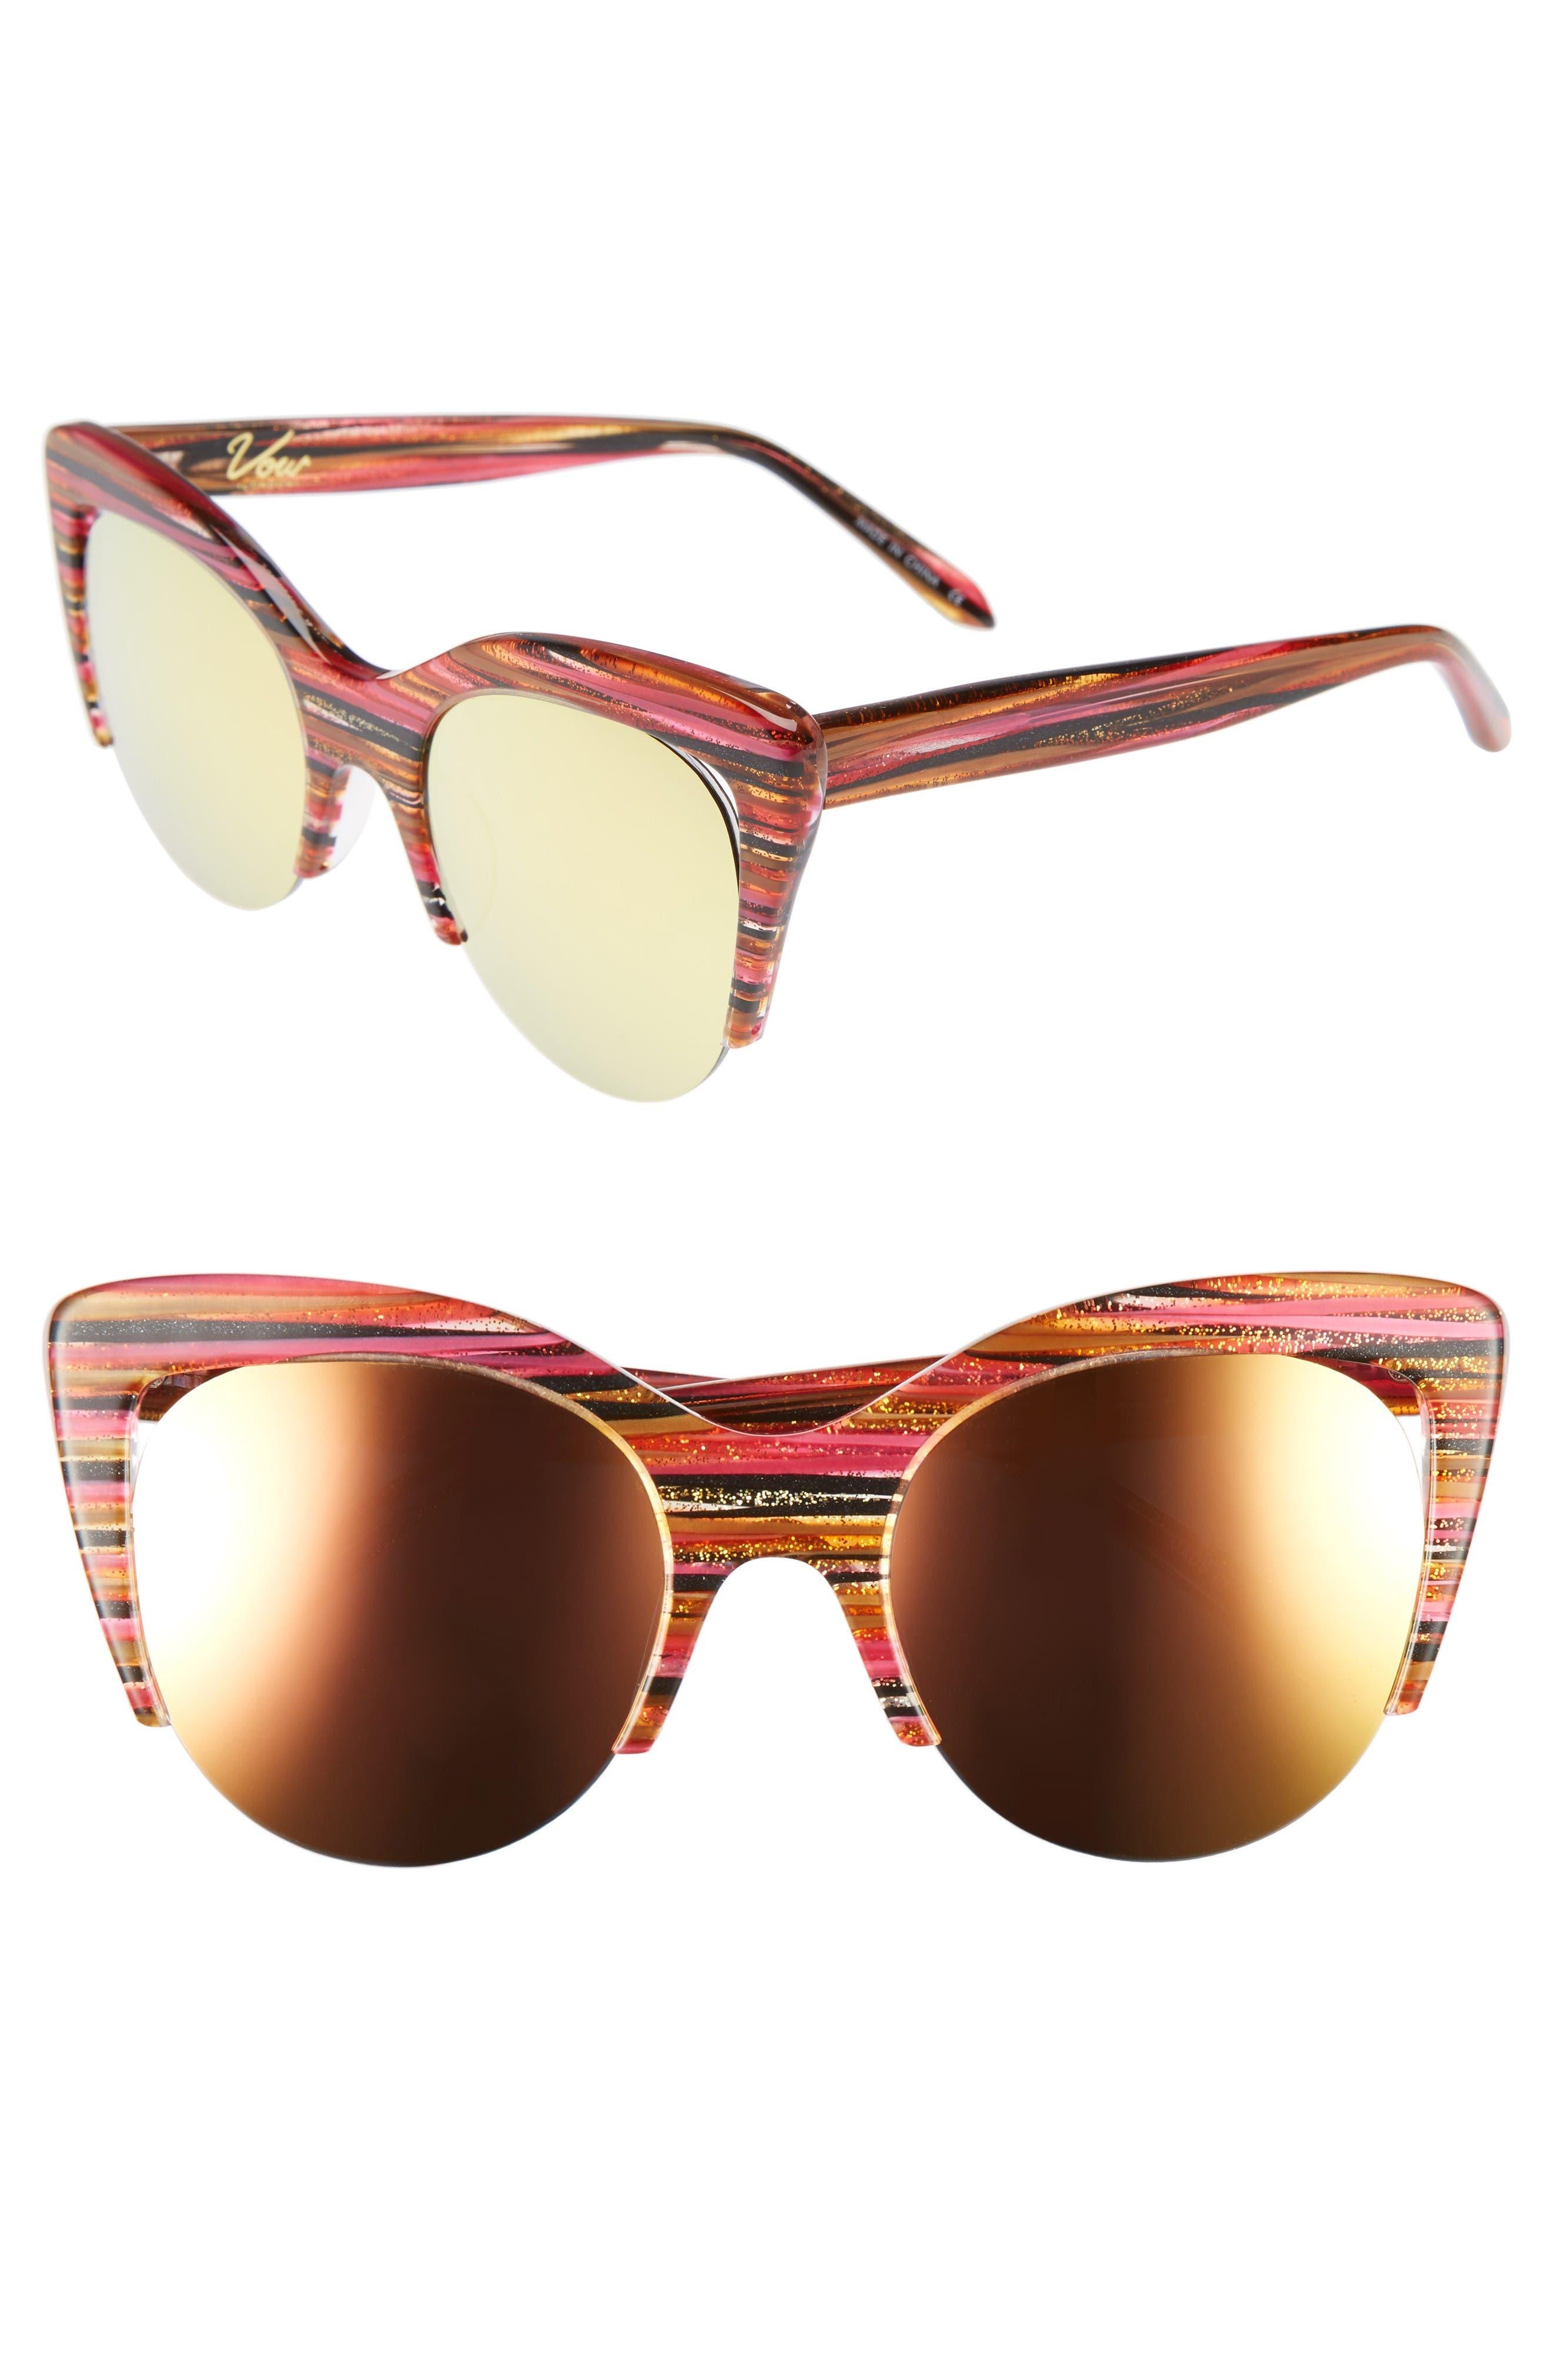 Vow London Mia 51mm Cat Eye Sunglasses